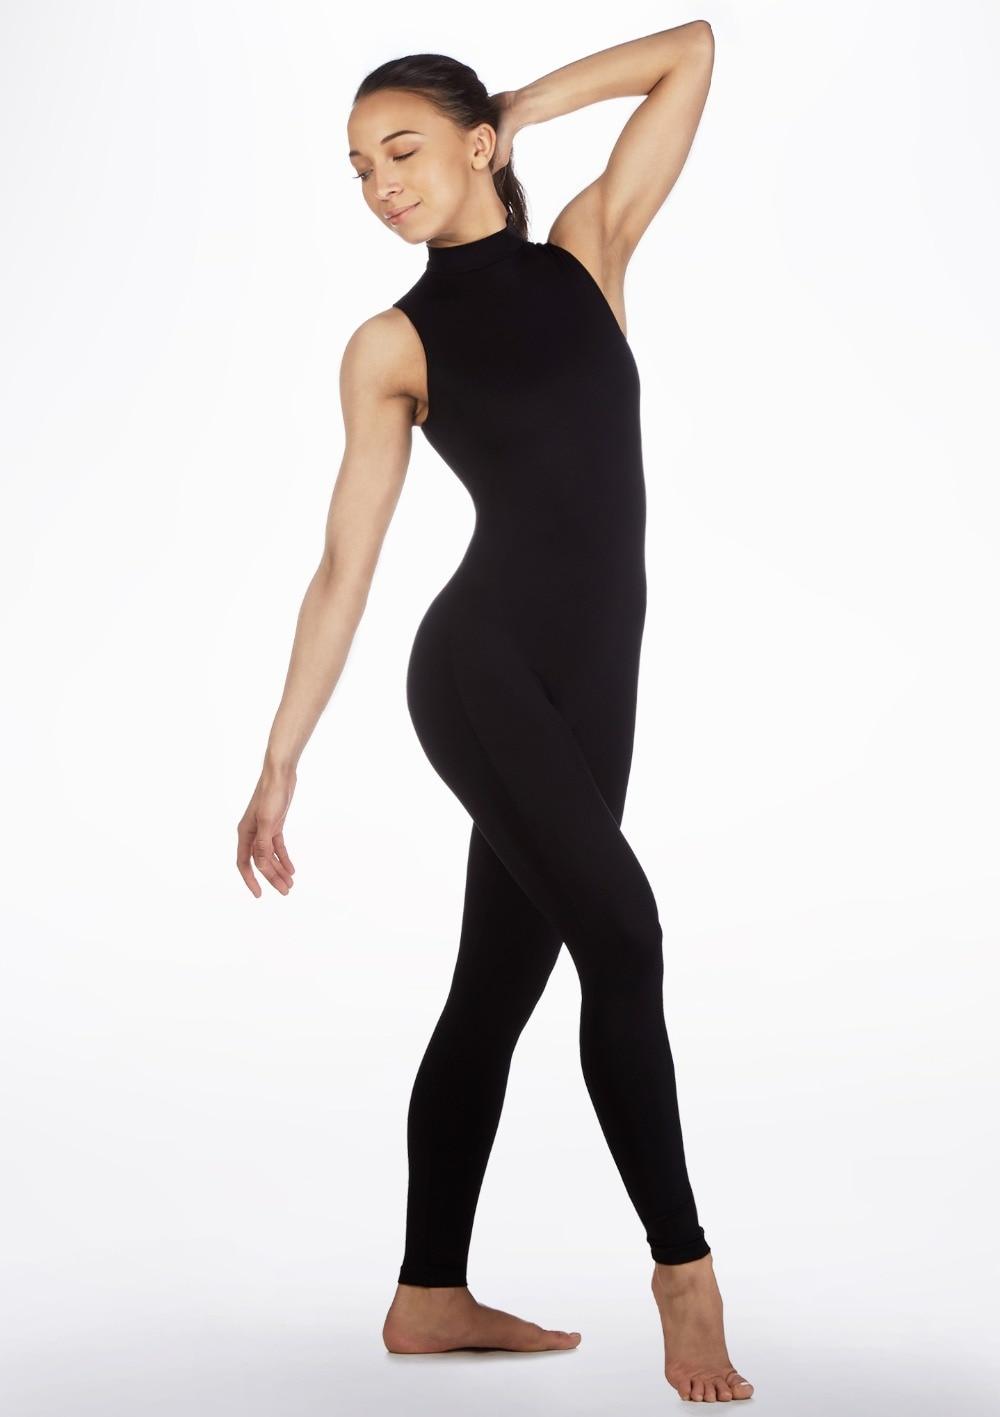 LZCMsoft Adult Sleeveless Turtleneck Unitards Lycra Nylon Keyhole Catsuits Women Spandex Dancewear Black Team Sports Outfits